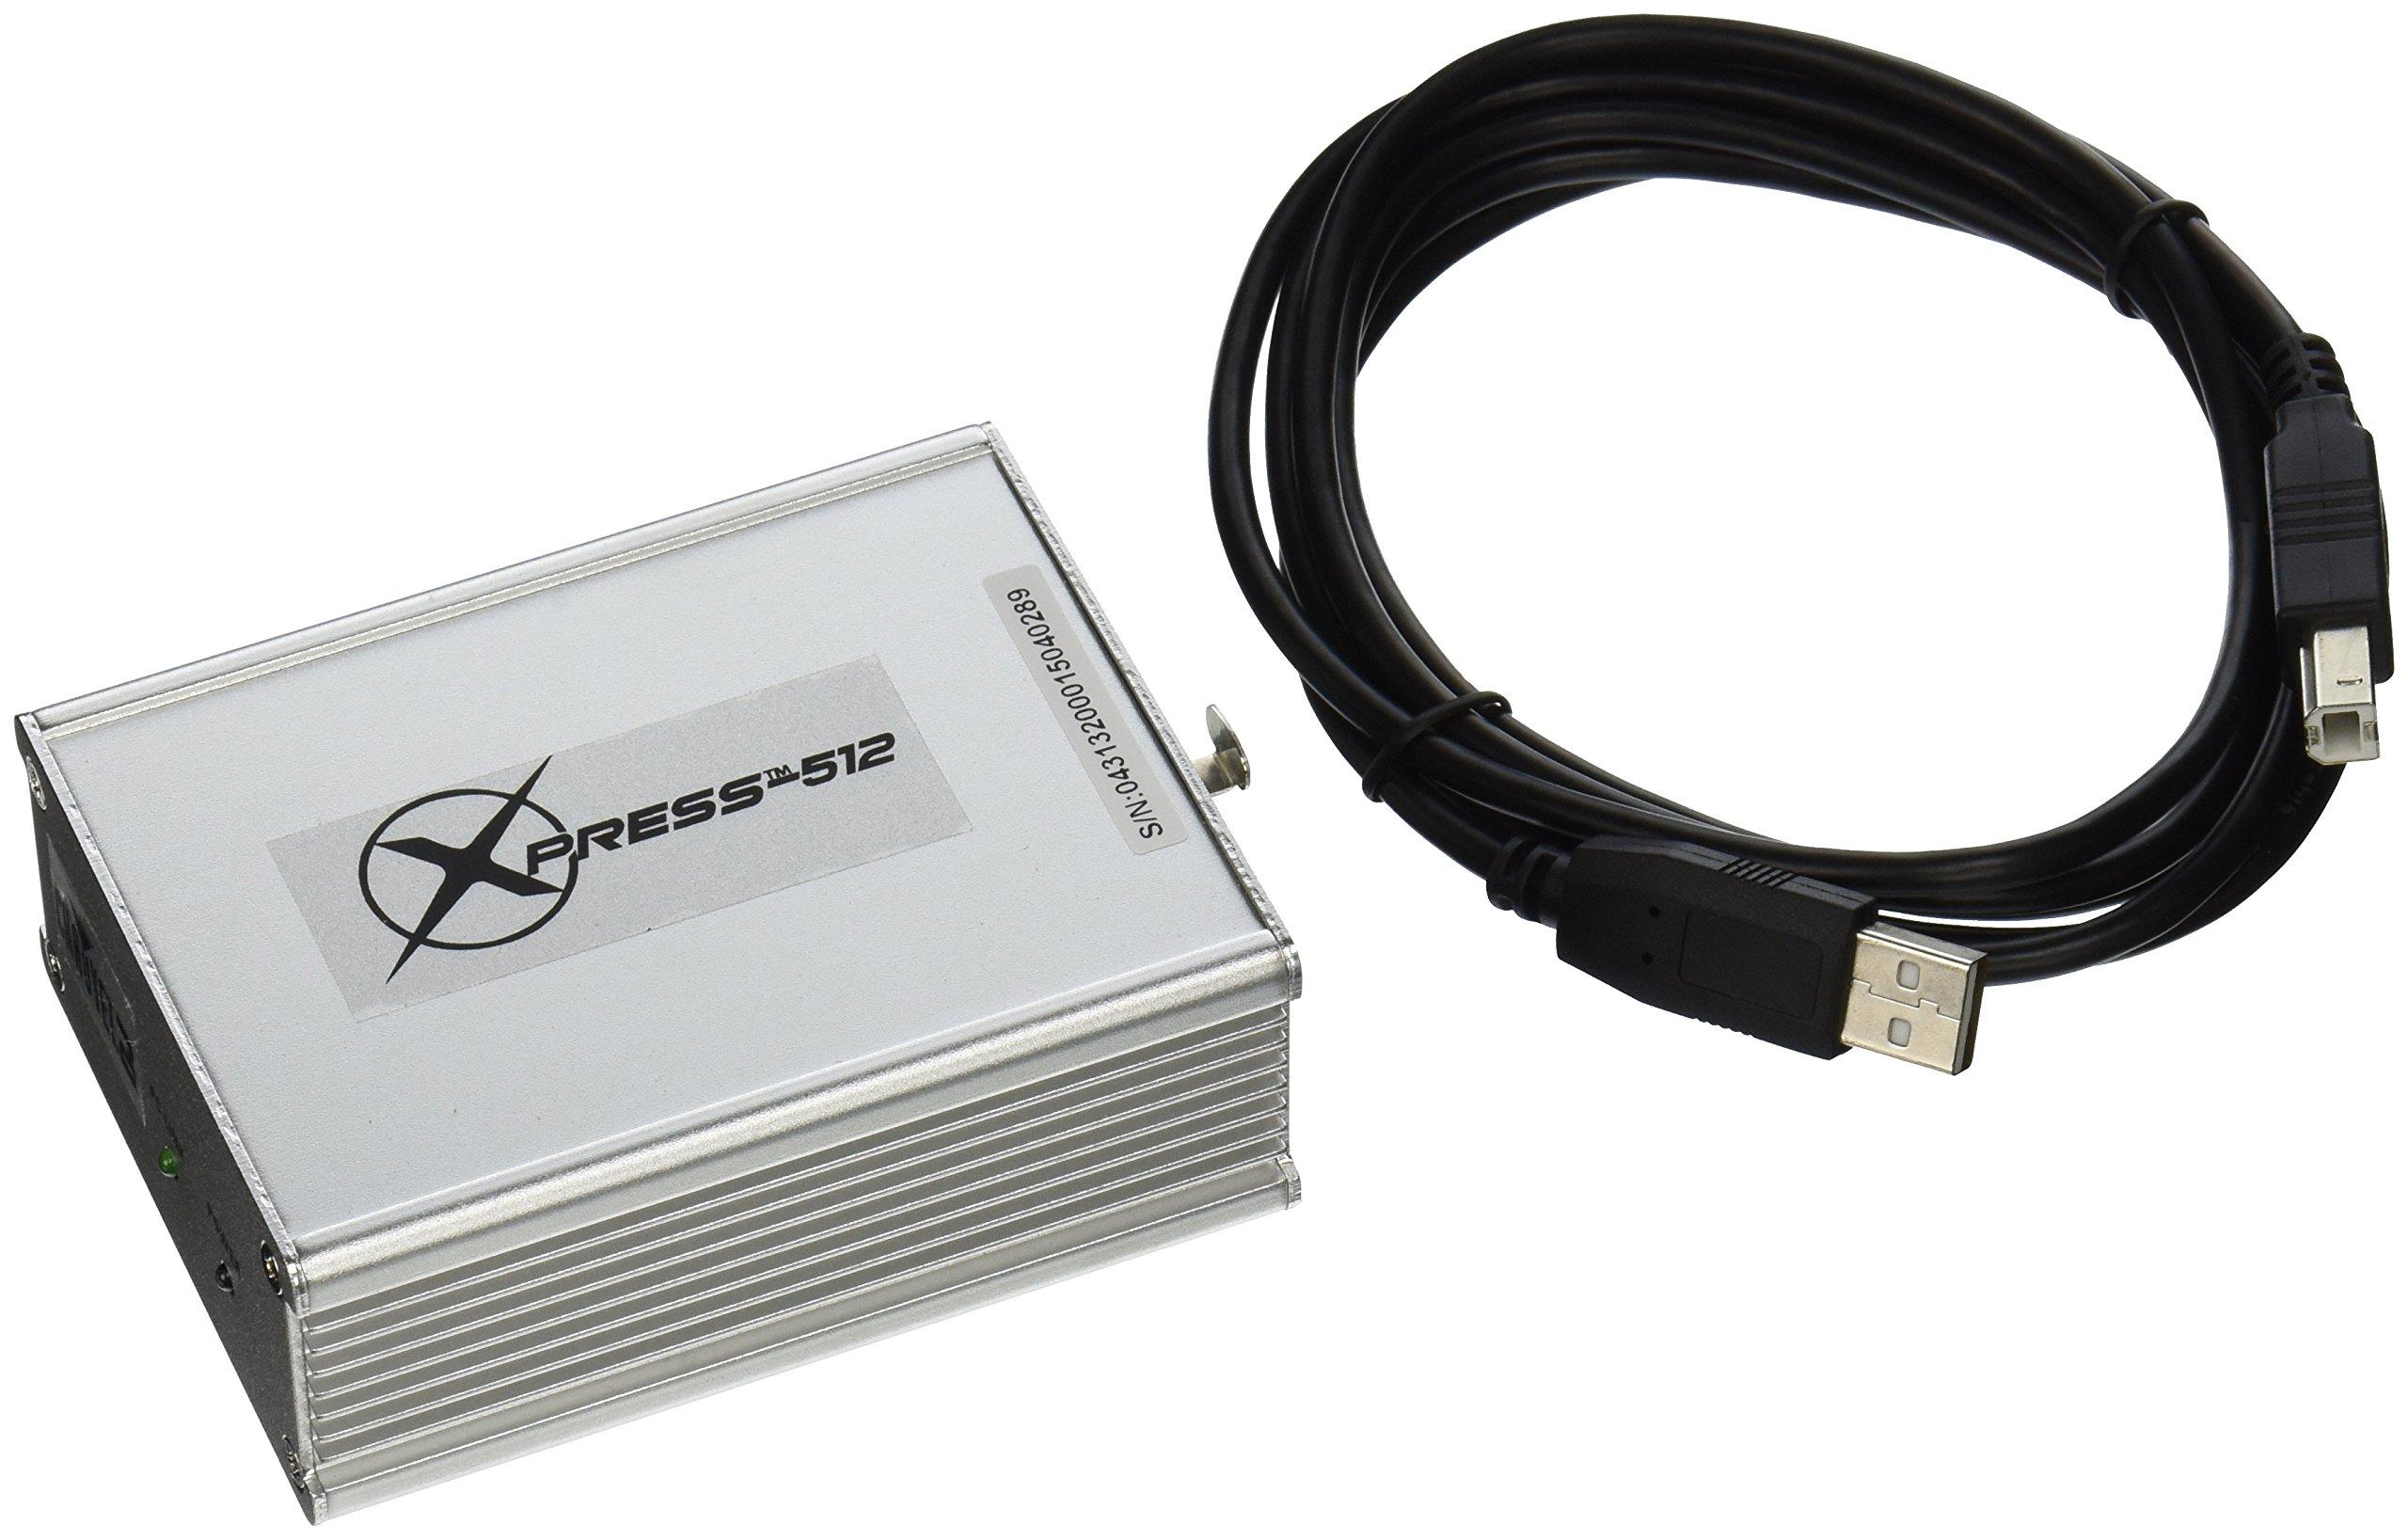 CHAUVET DJ Xpress-512 DMX-512 USB Interface by CHAUVET DJ